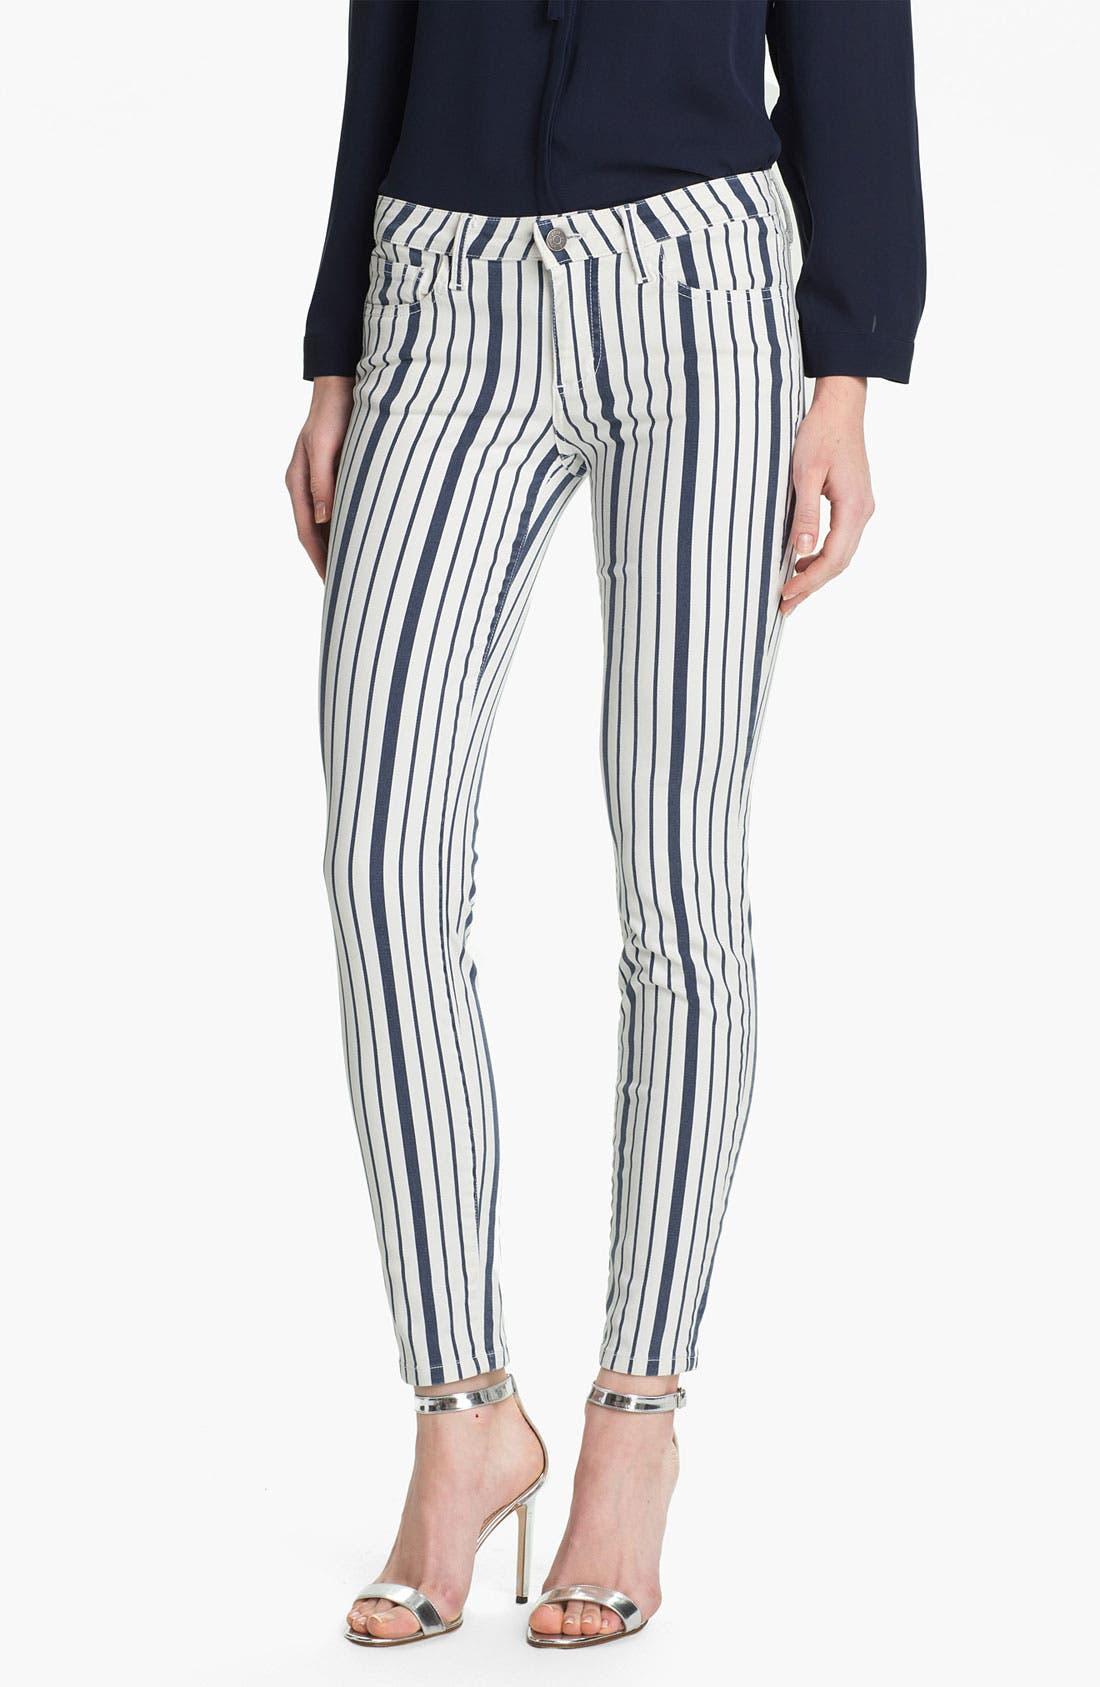 Alternate Image 1 Selected - Joie 'Nailah' Skinny Pants